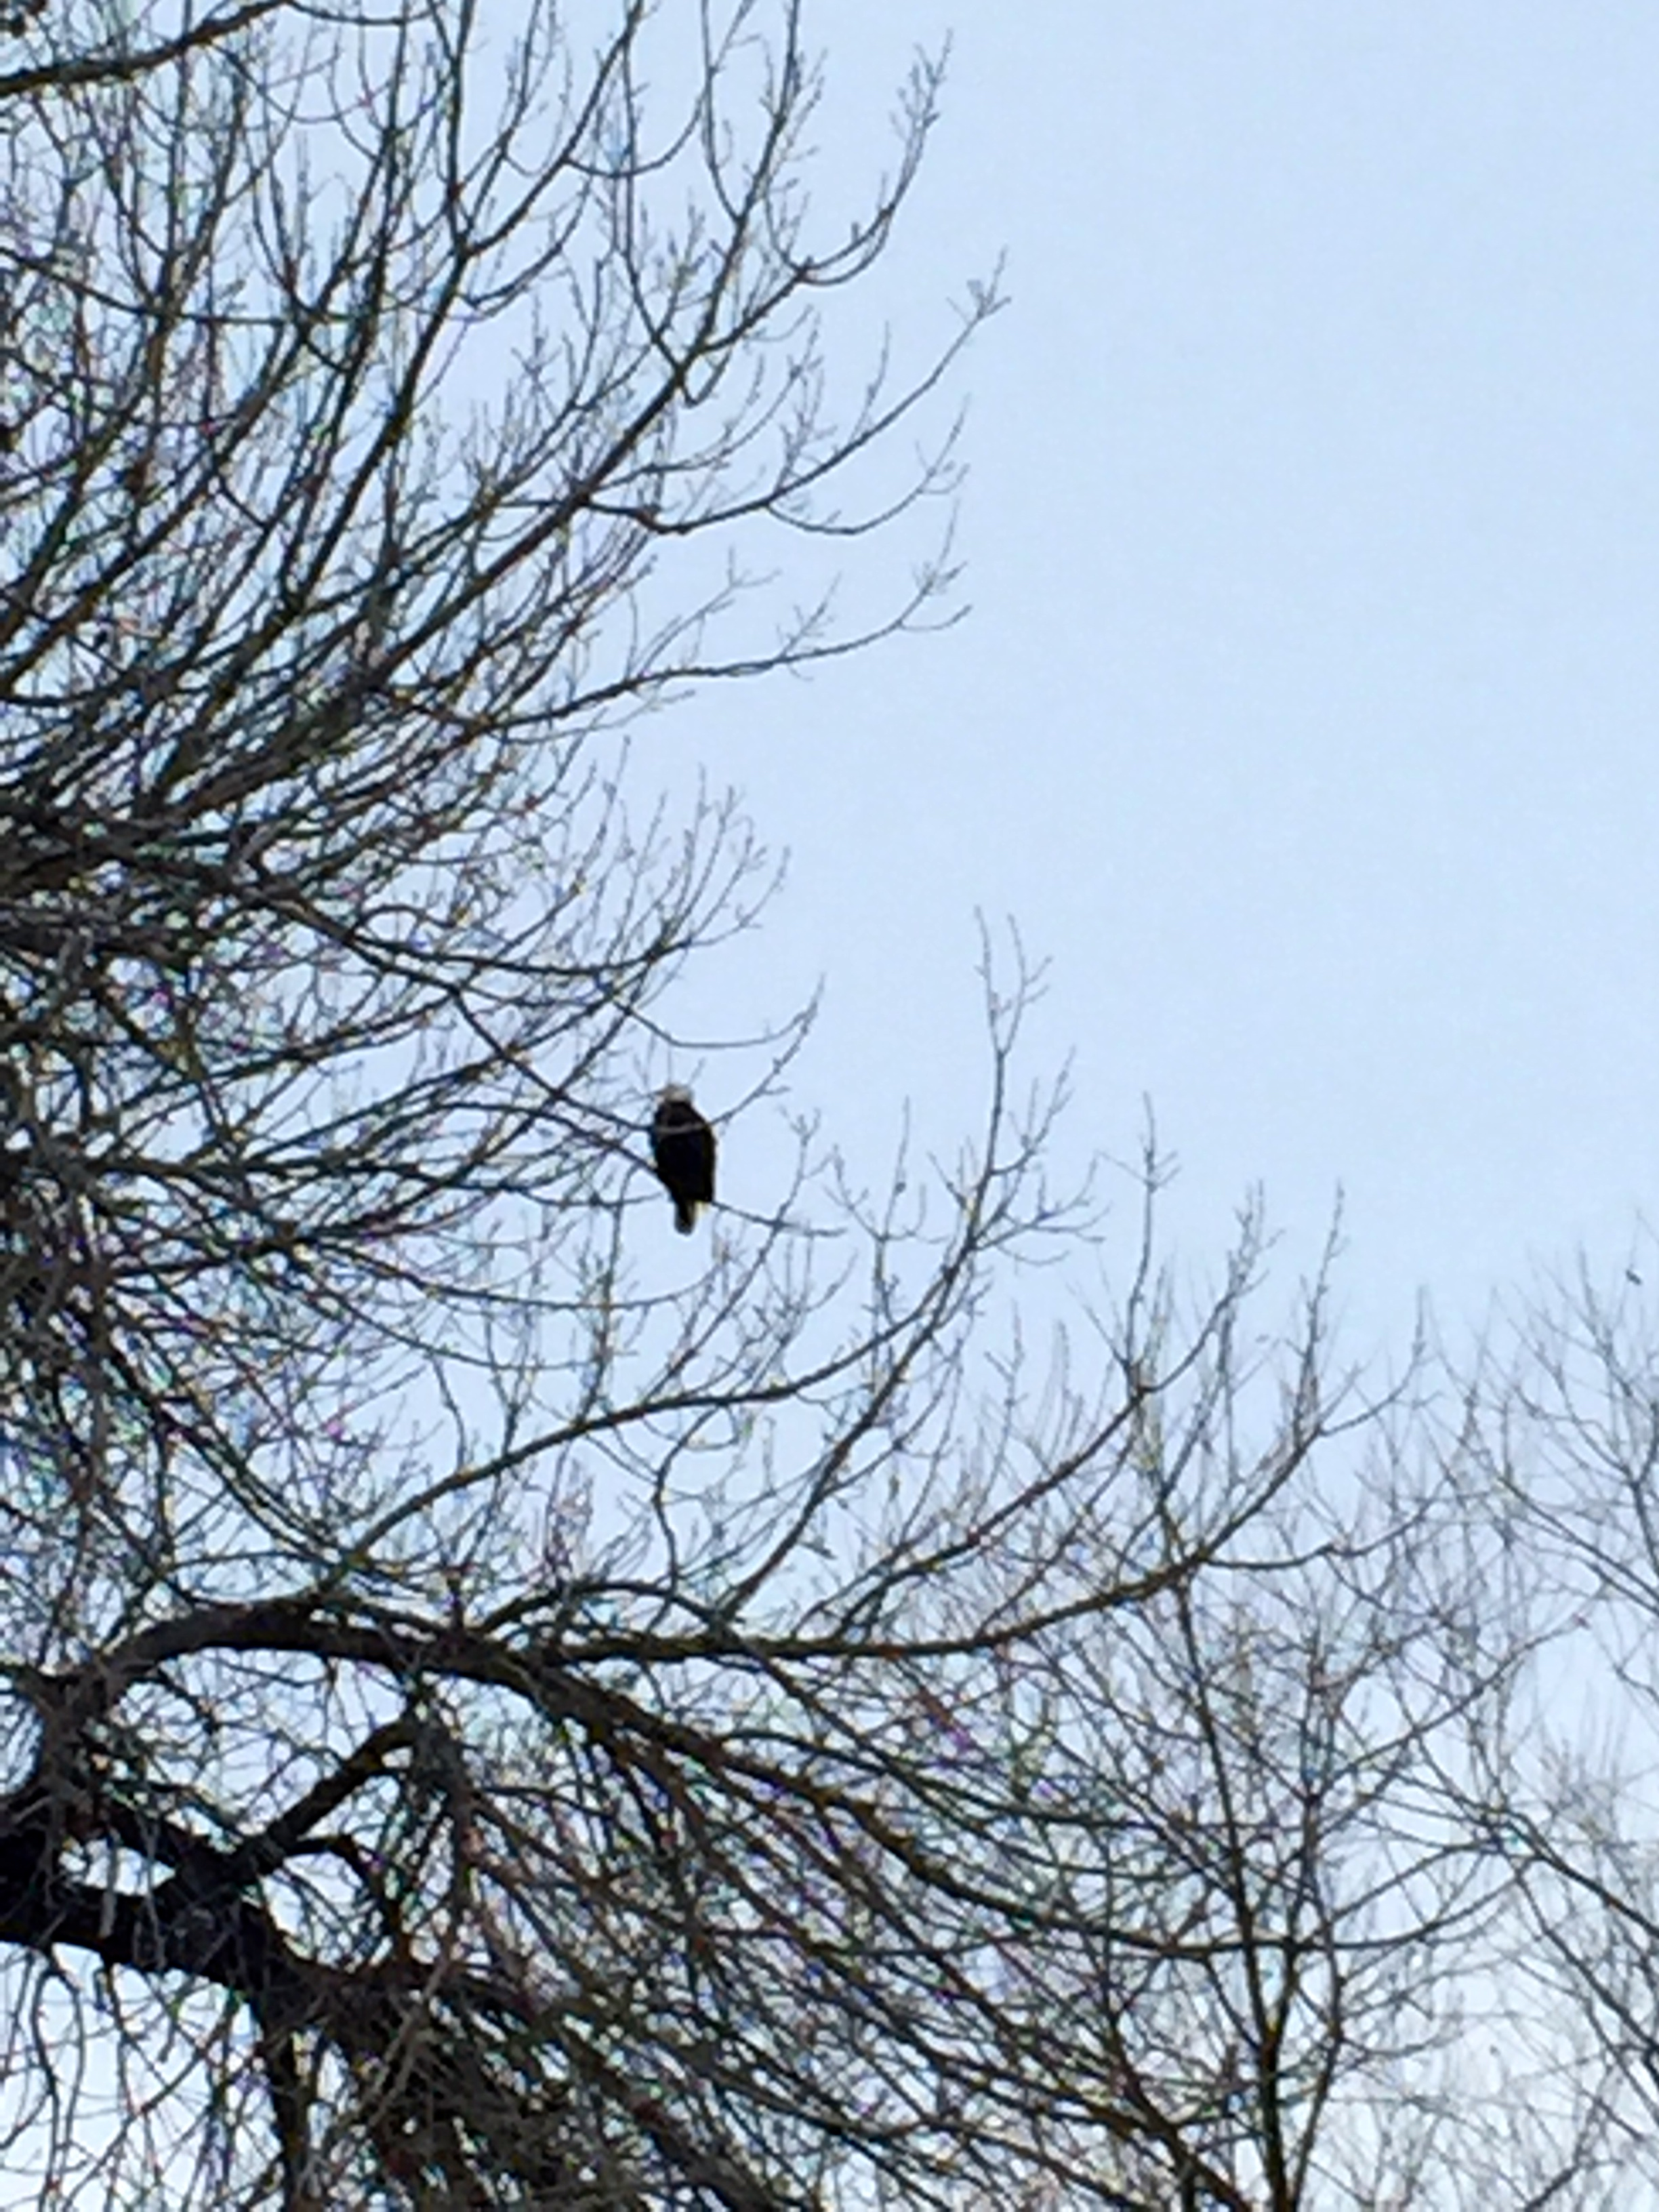 Resident bald eagle